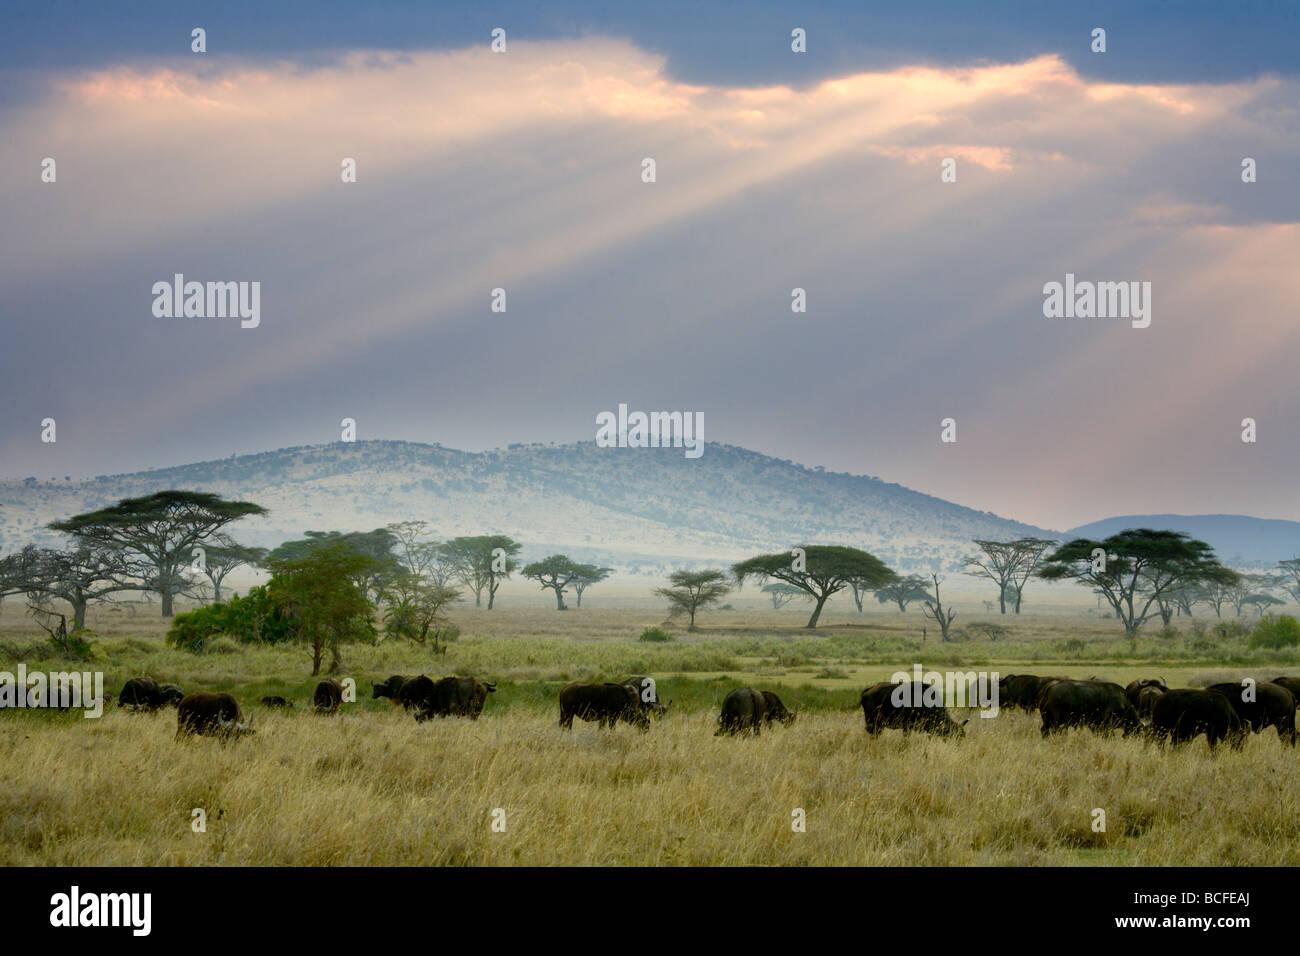 African Buffalo, Serengeti National Park, Tanzania - Stock Image